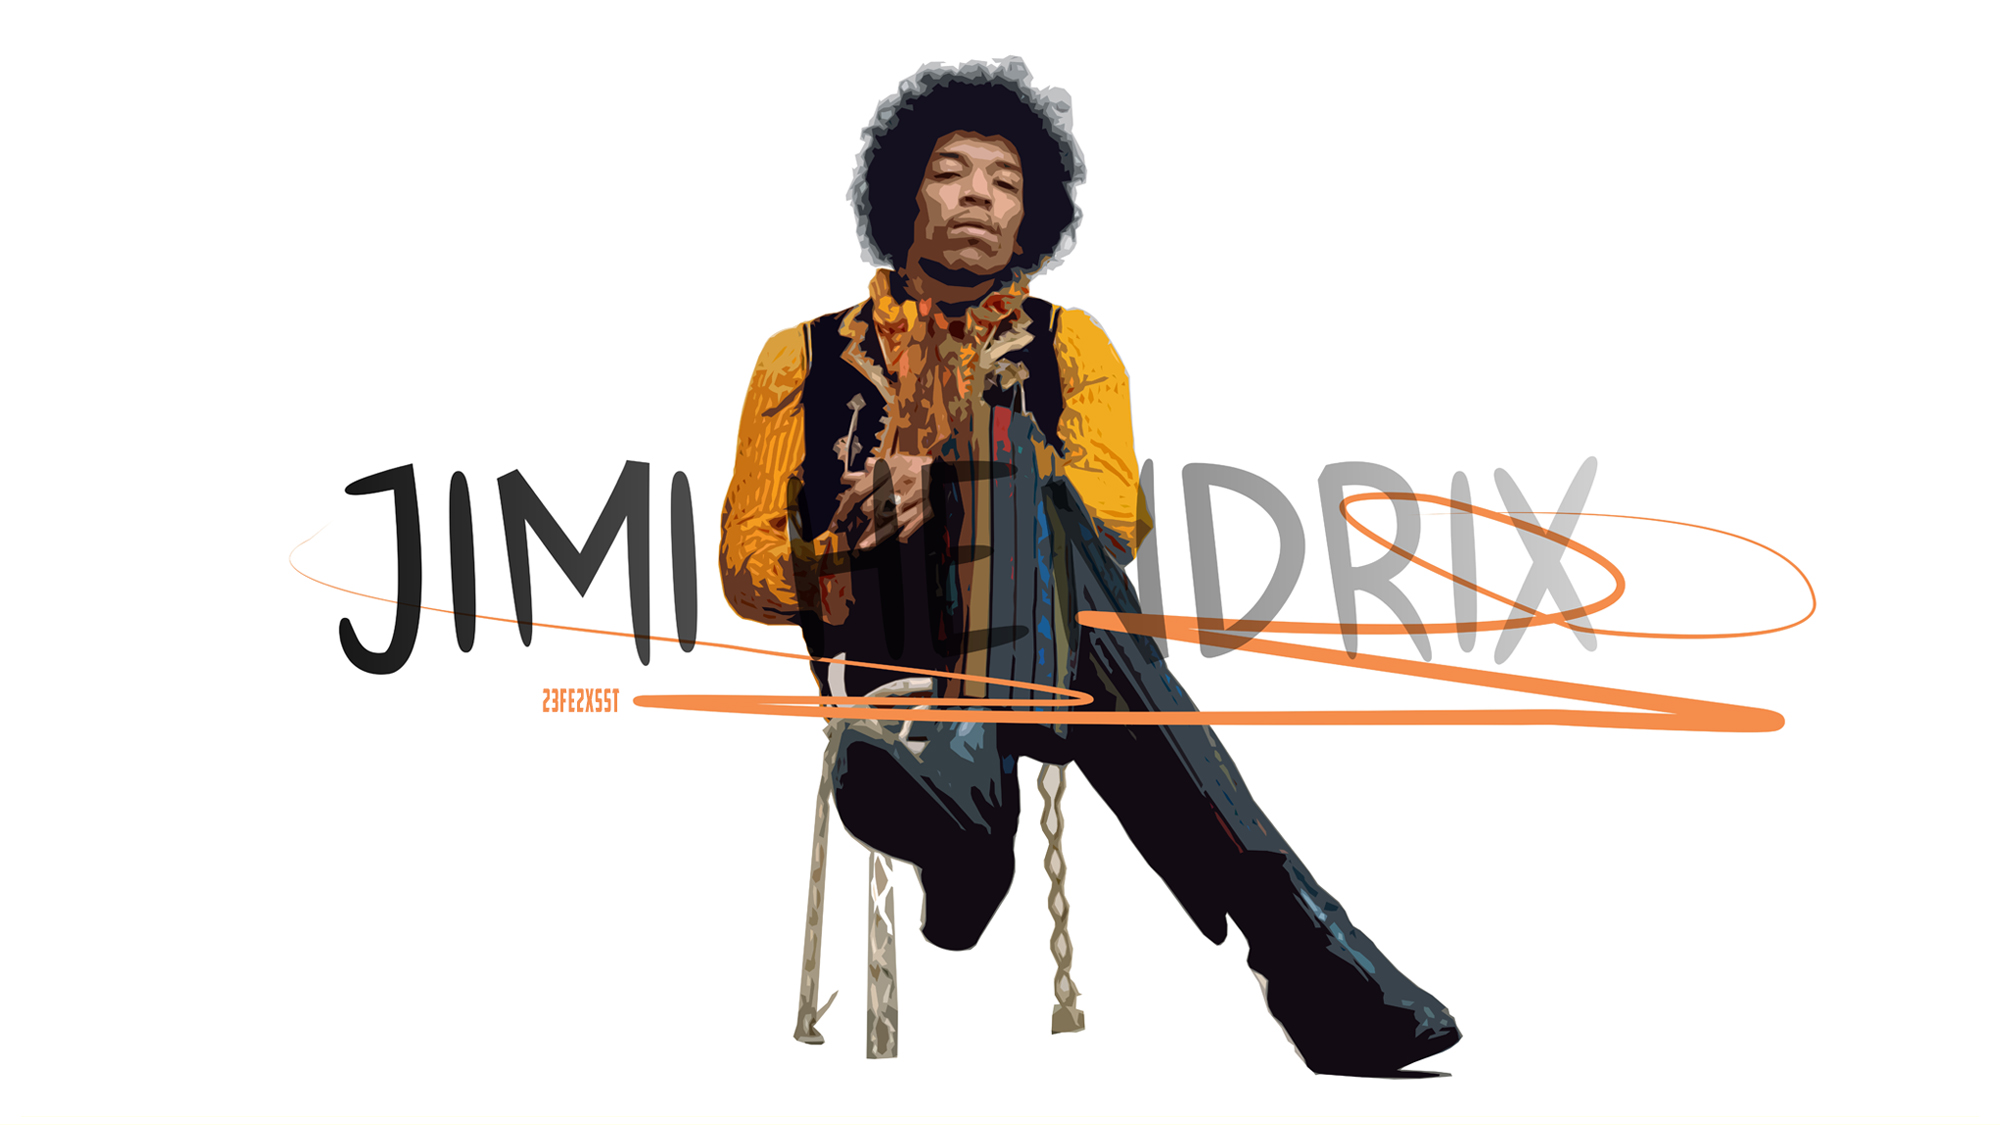 Jimi Hendrix HD Wallpaper | Background Image | 2000x1125 ...